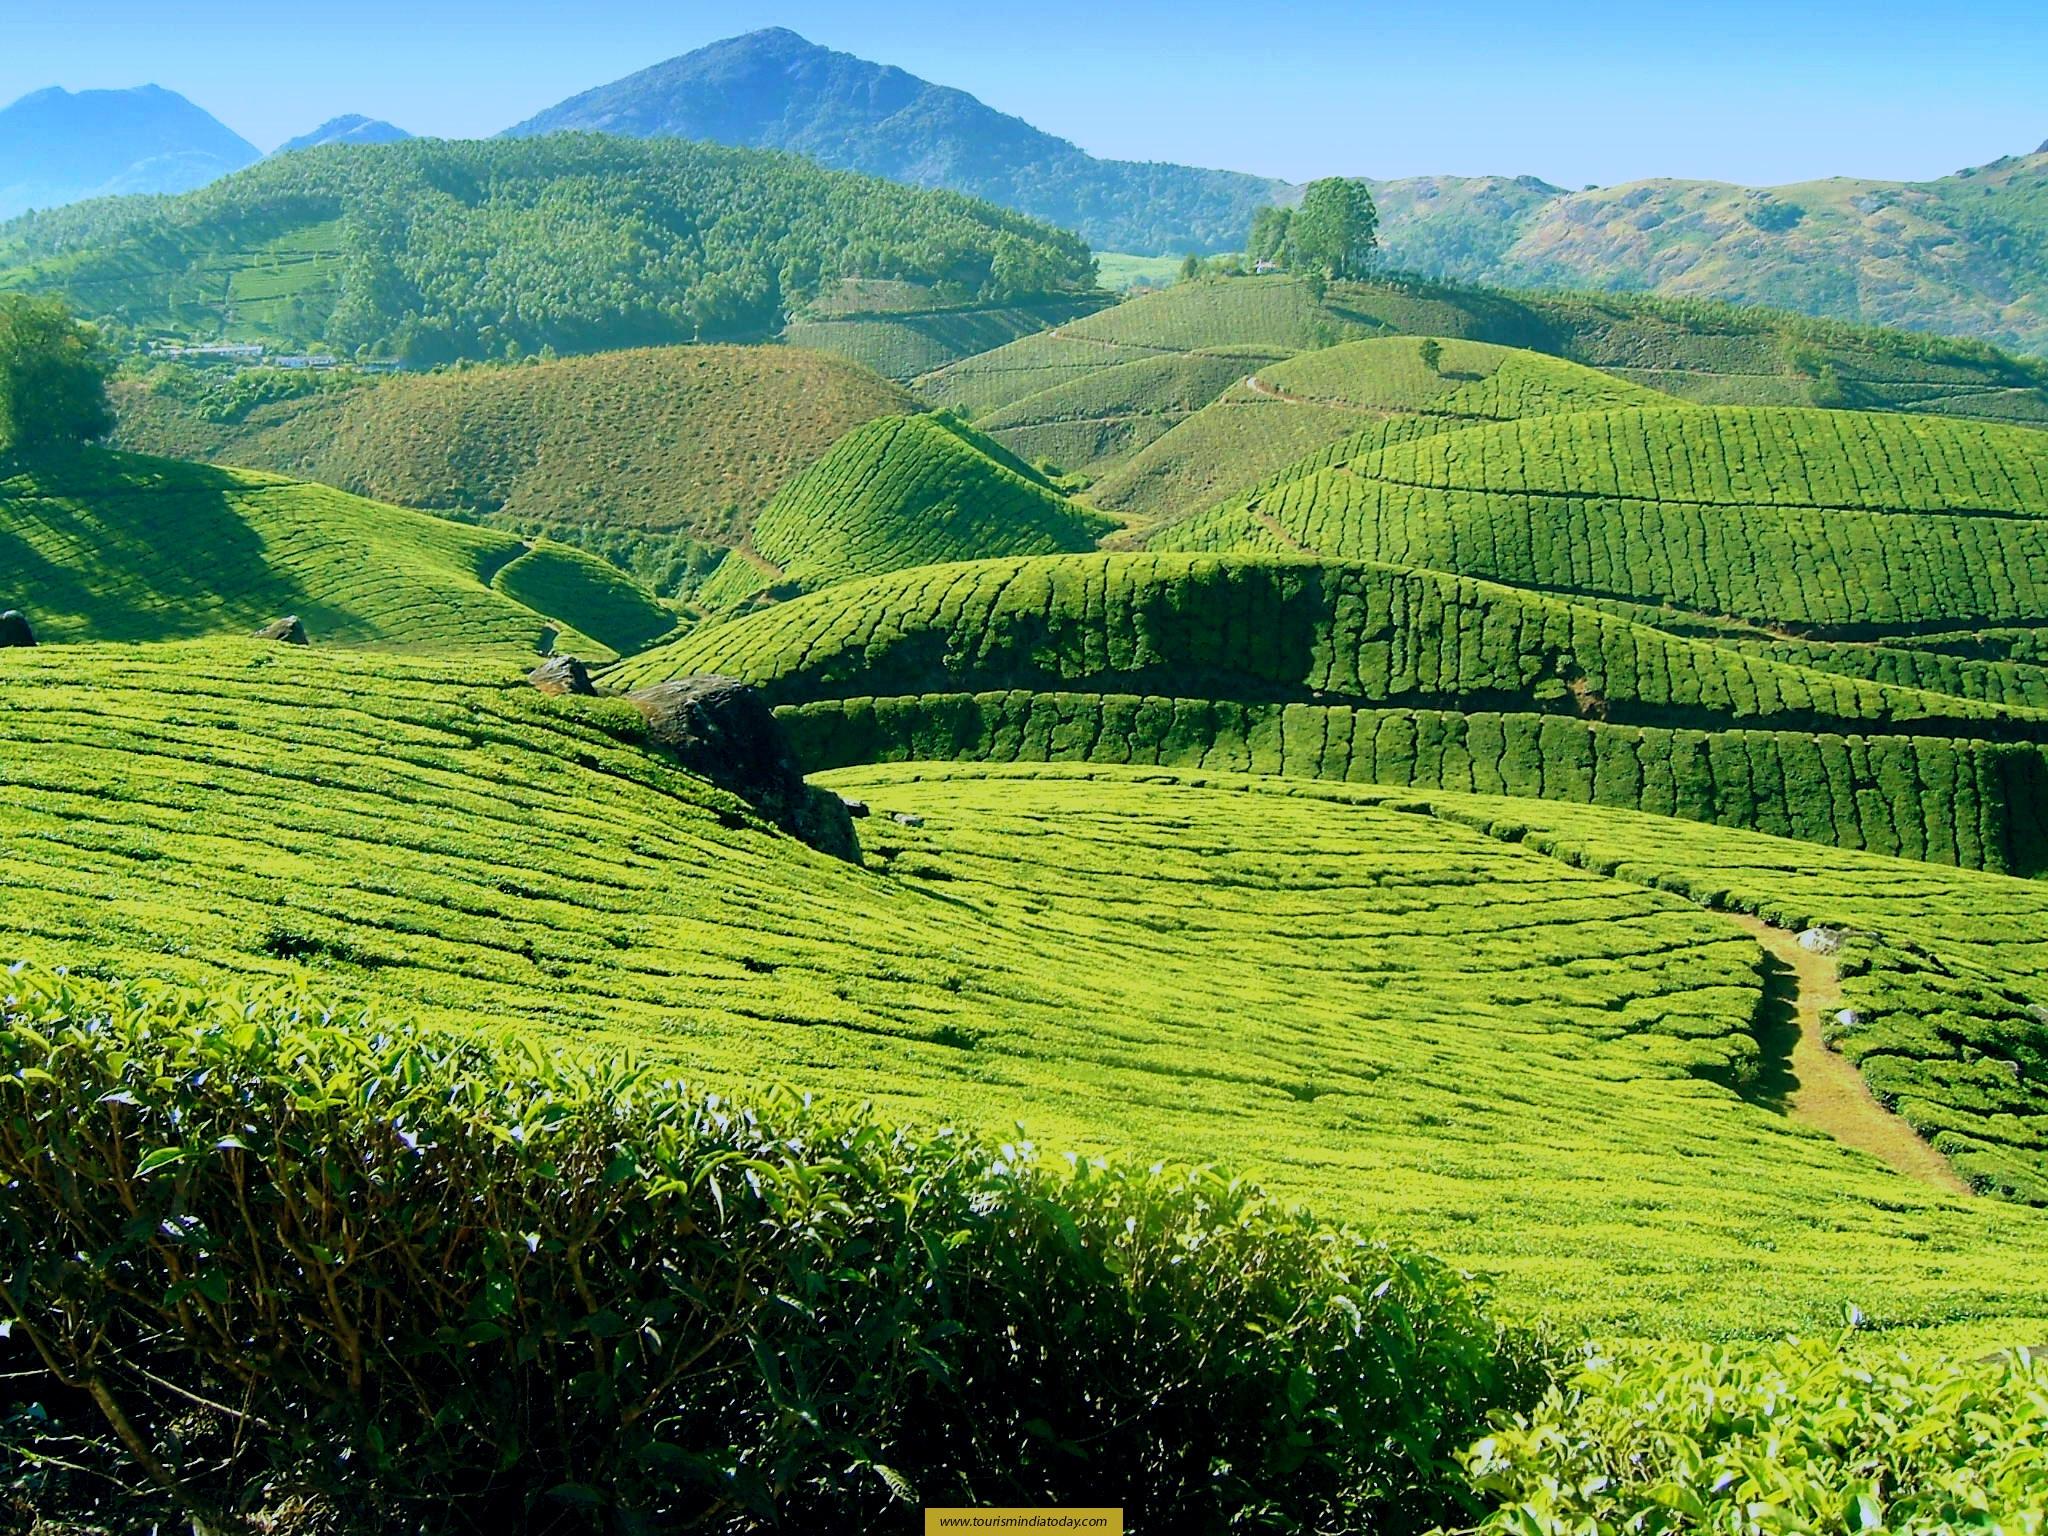 Paragliding Wallpaper Hd Most Famous Tea Plantation Land Munnar Adamseo25